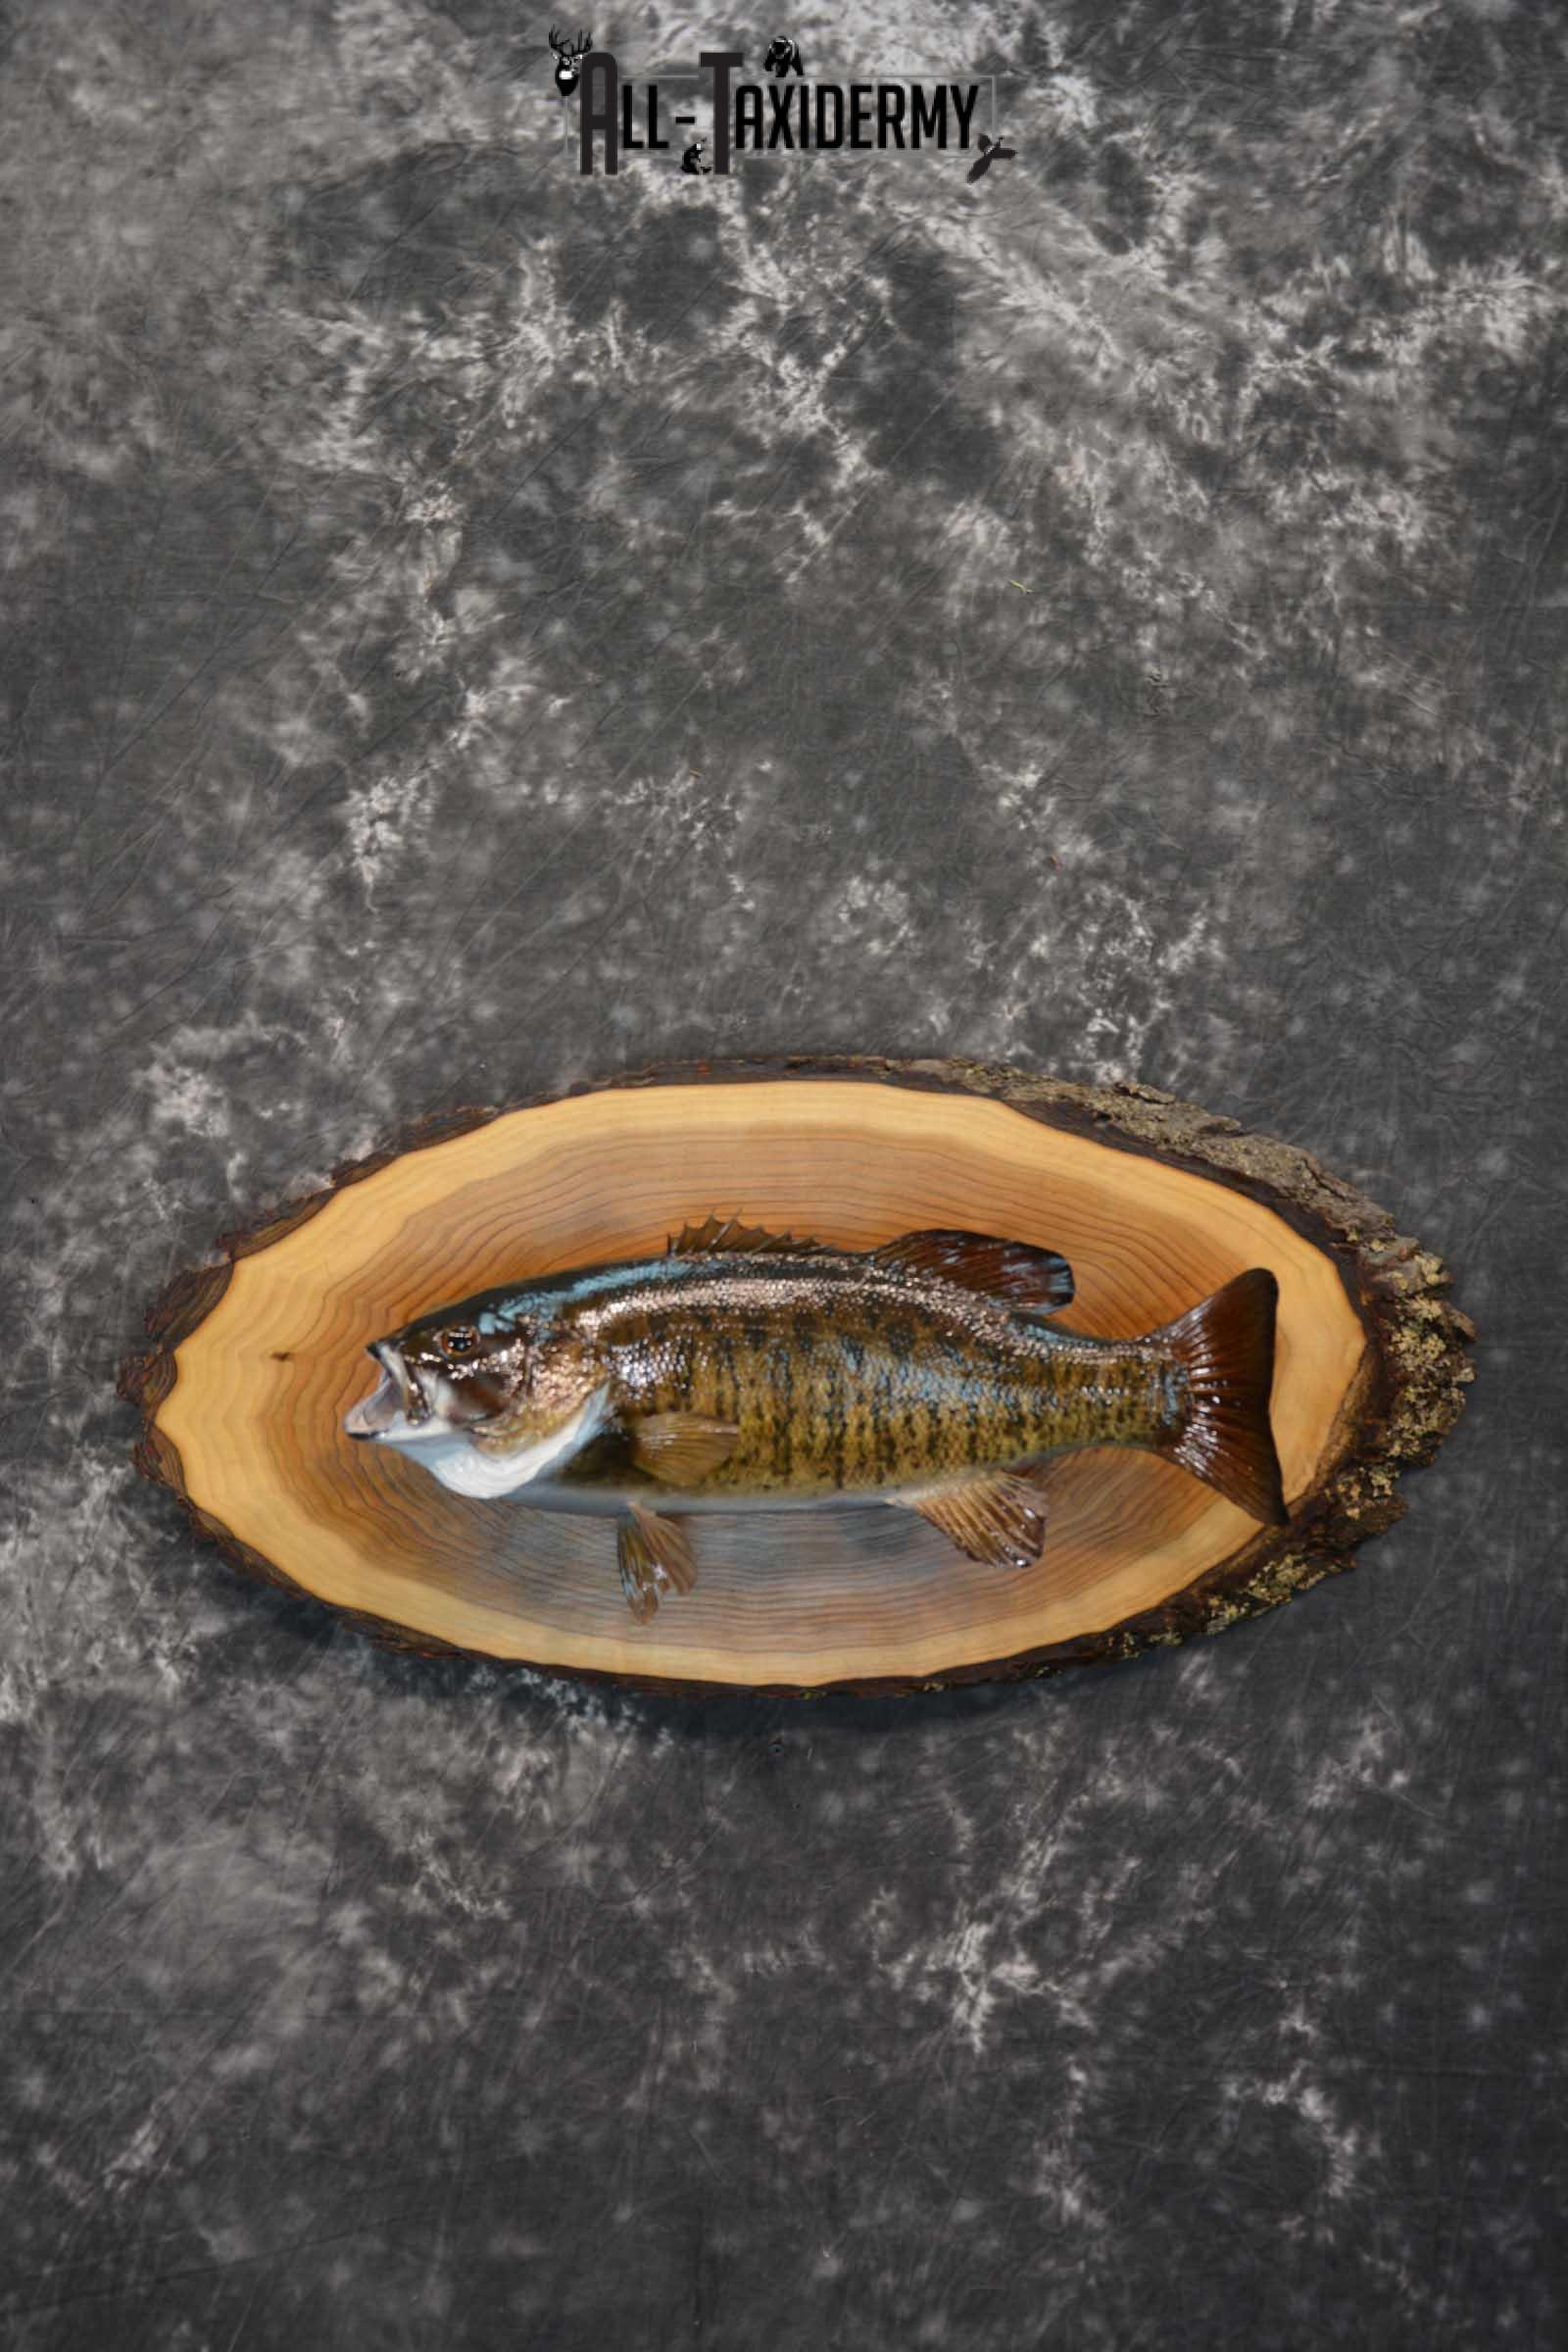 Small Mouth  Bass Taxidermy skin mount on hardwood slab SKU 1608